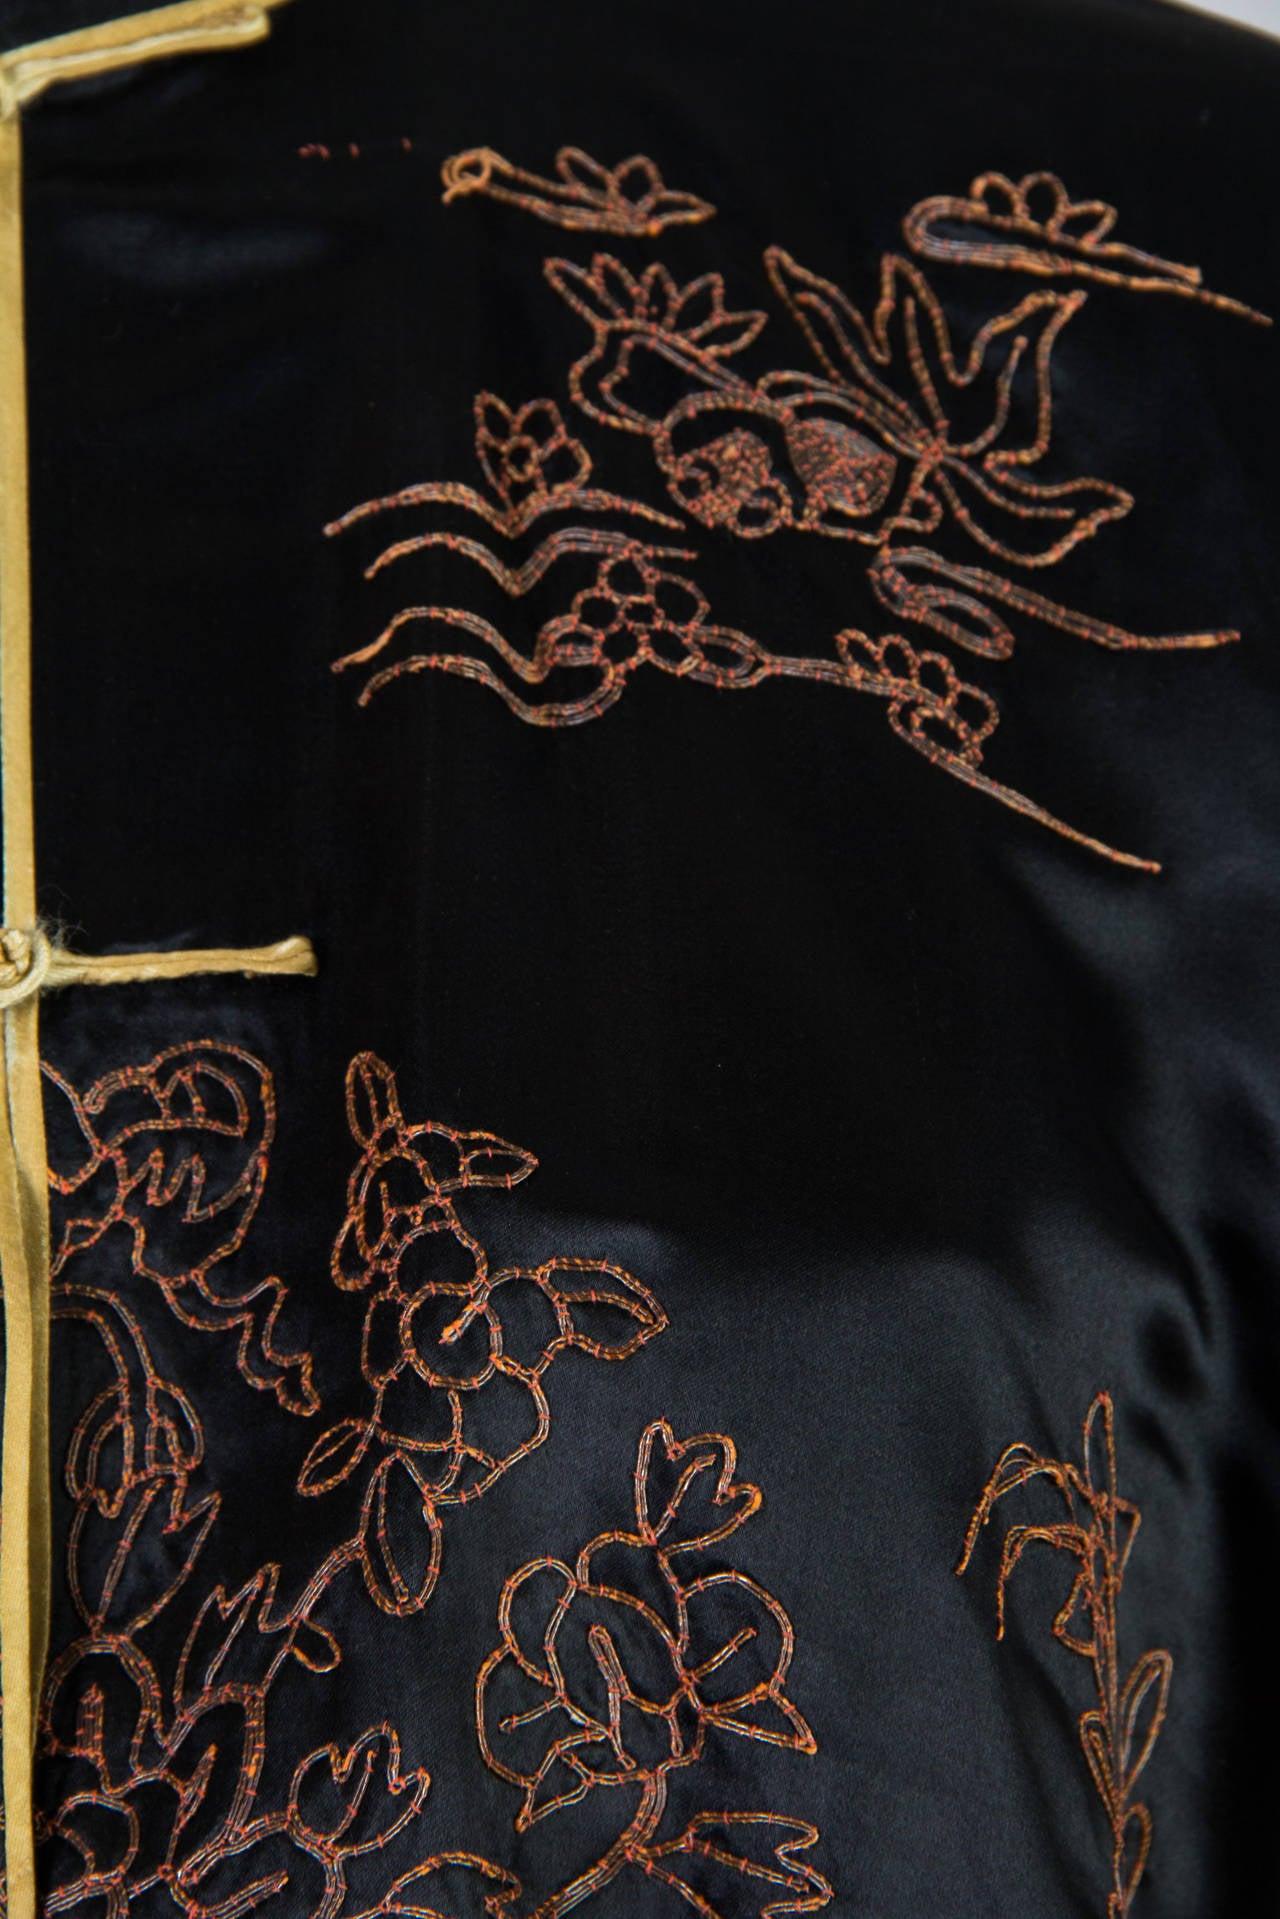 Early Chinese Embroidered Jacket Kimono style 9